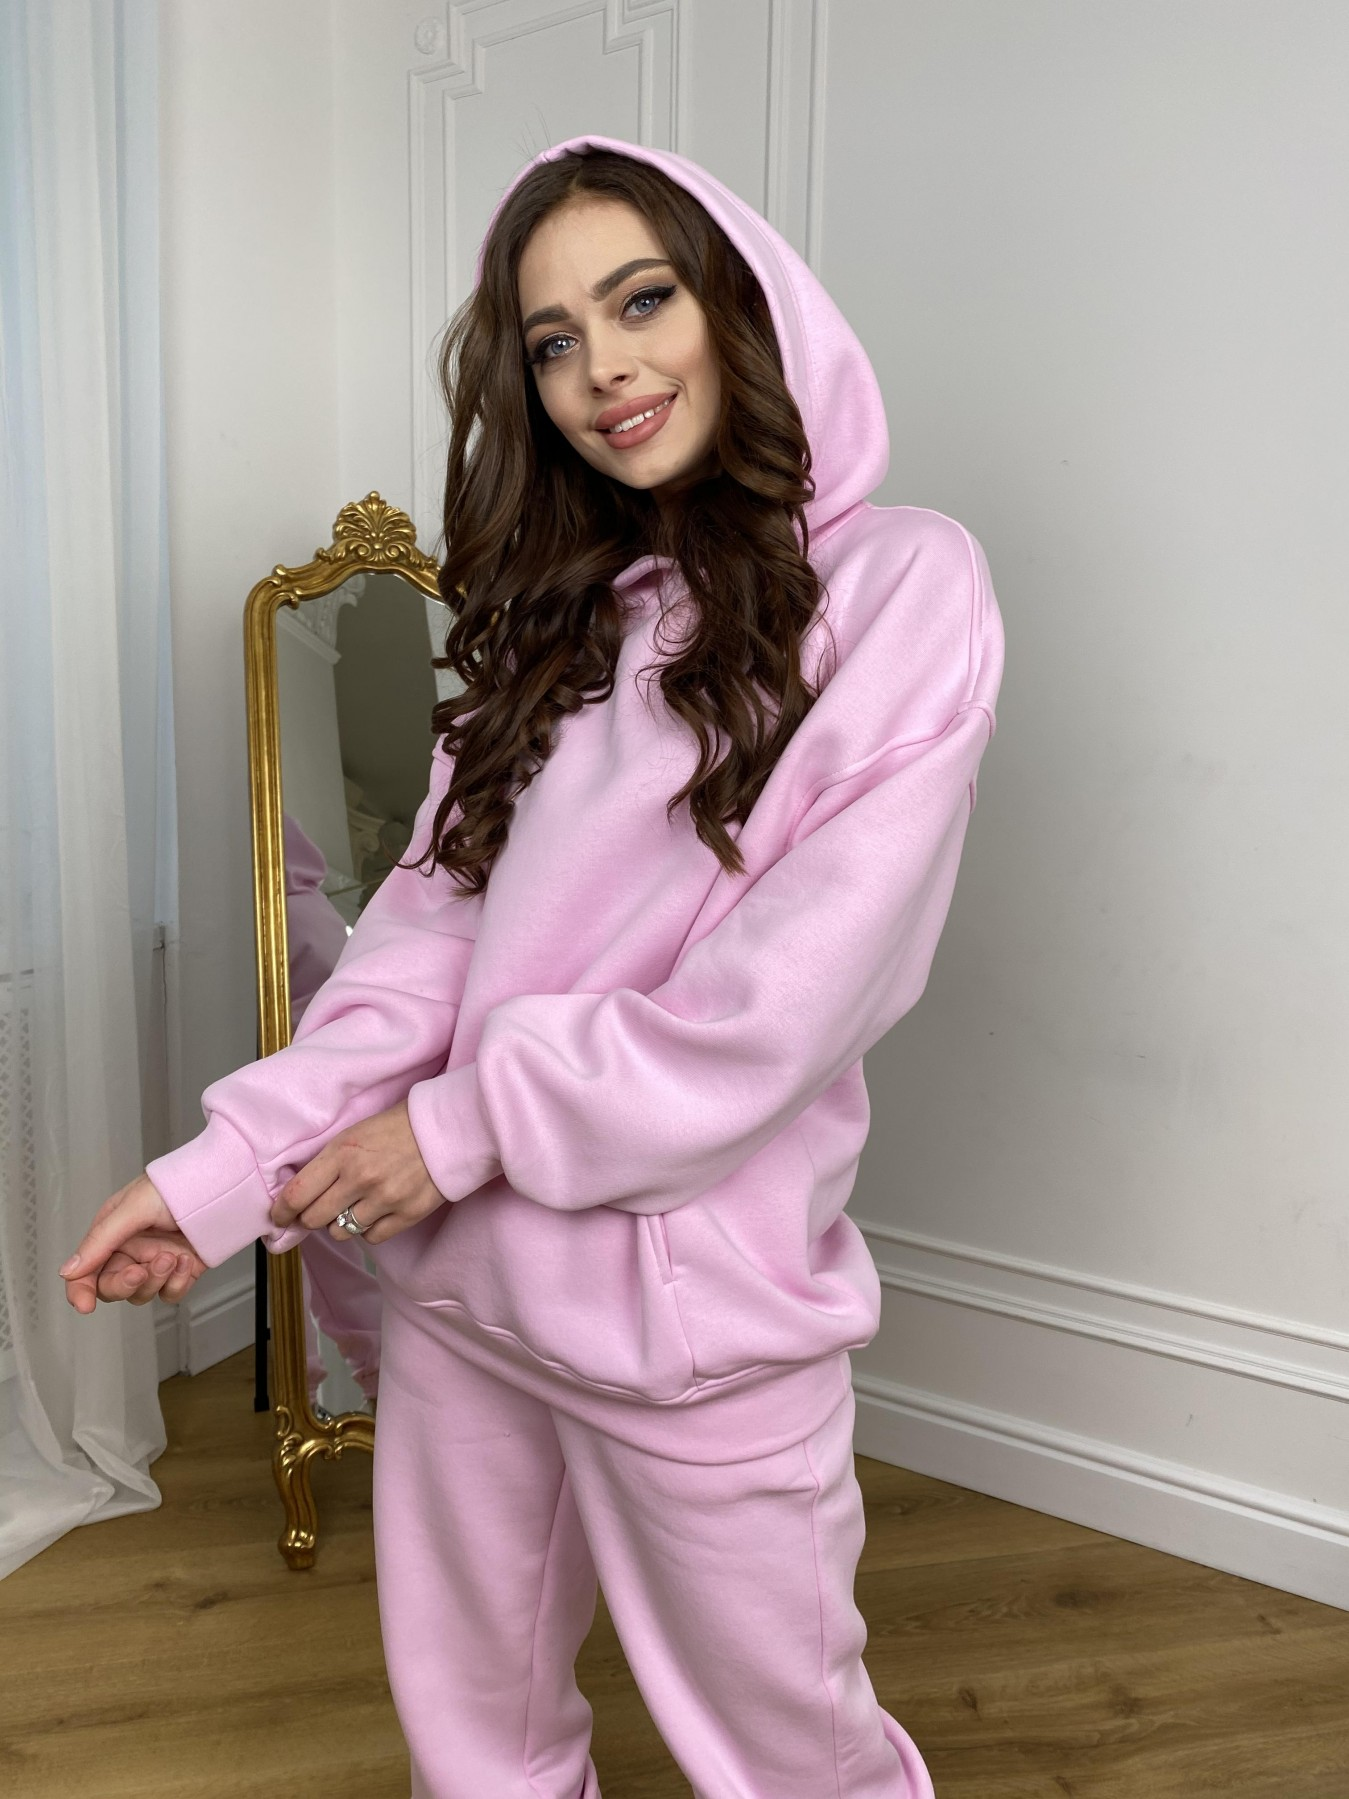 Марион костюм в  стиле Oversize  3х нитка 9651 АРТ. 46922 Цвет: Розовый - фото 6, интернет магазин tm-modus.ru